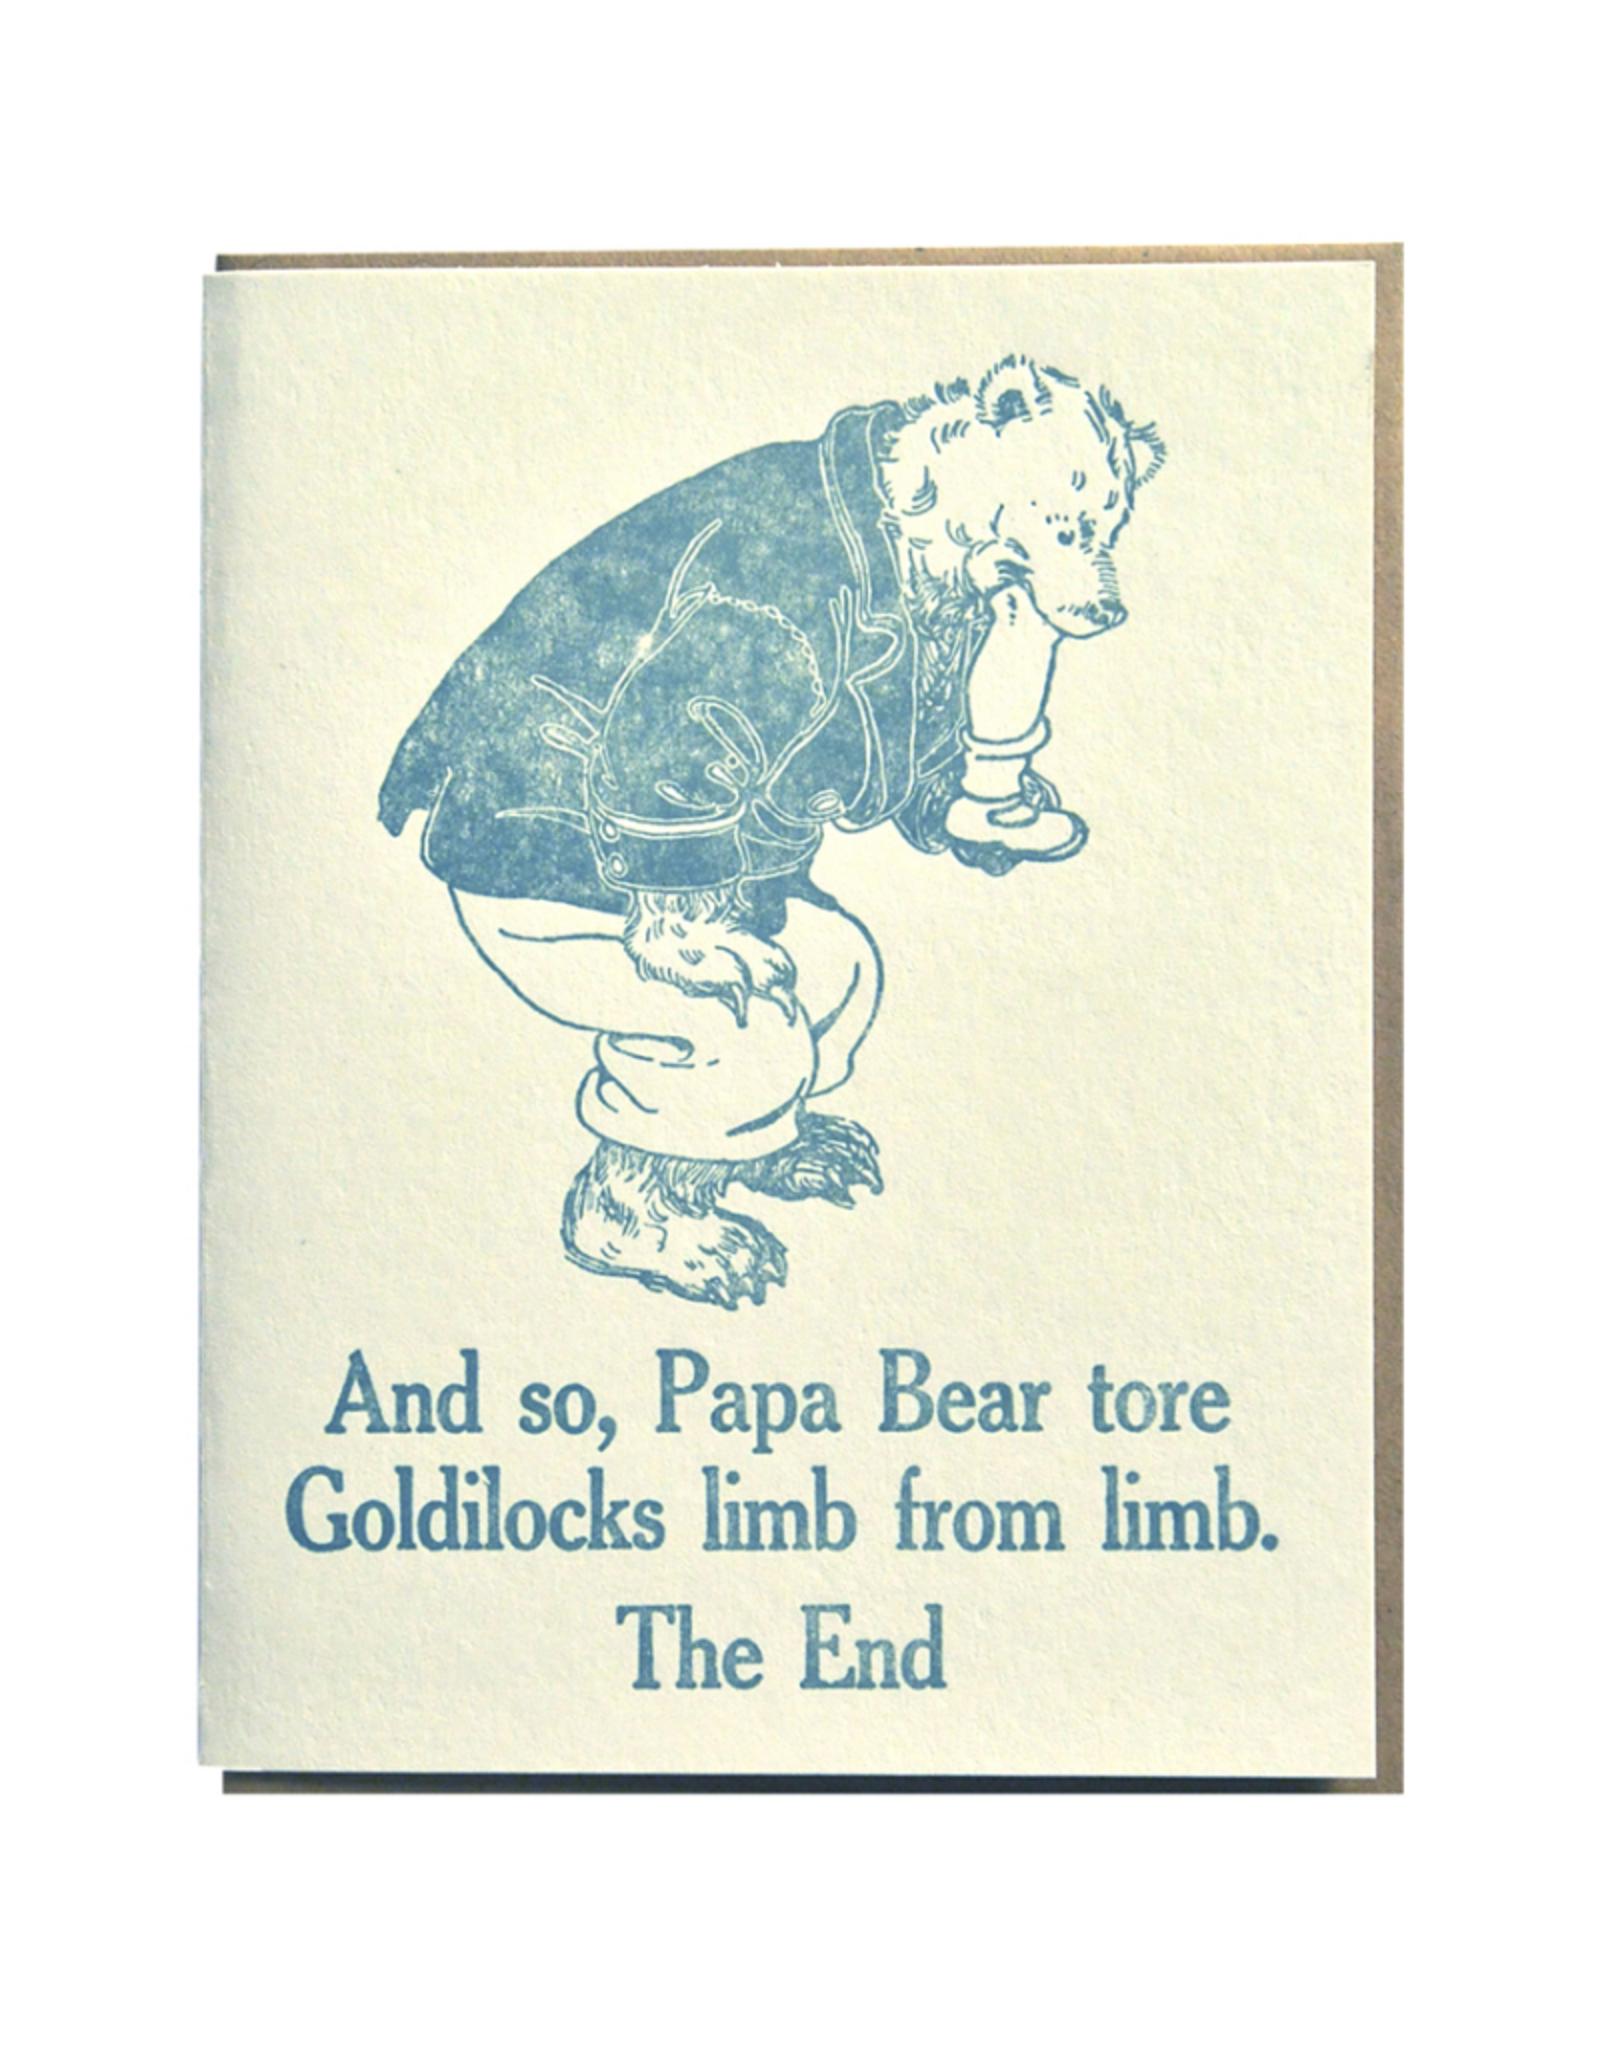 Zeichen Press Limb From Limb Humorous Card